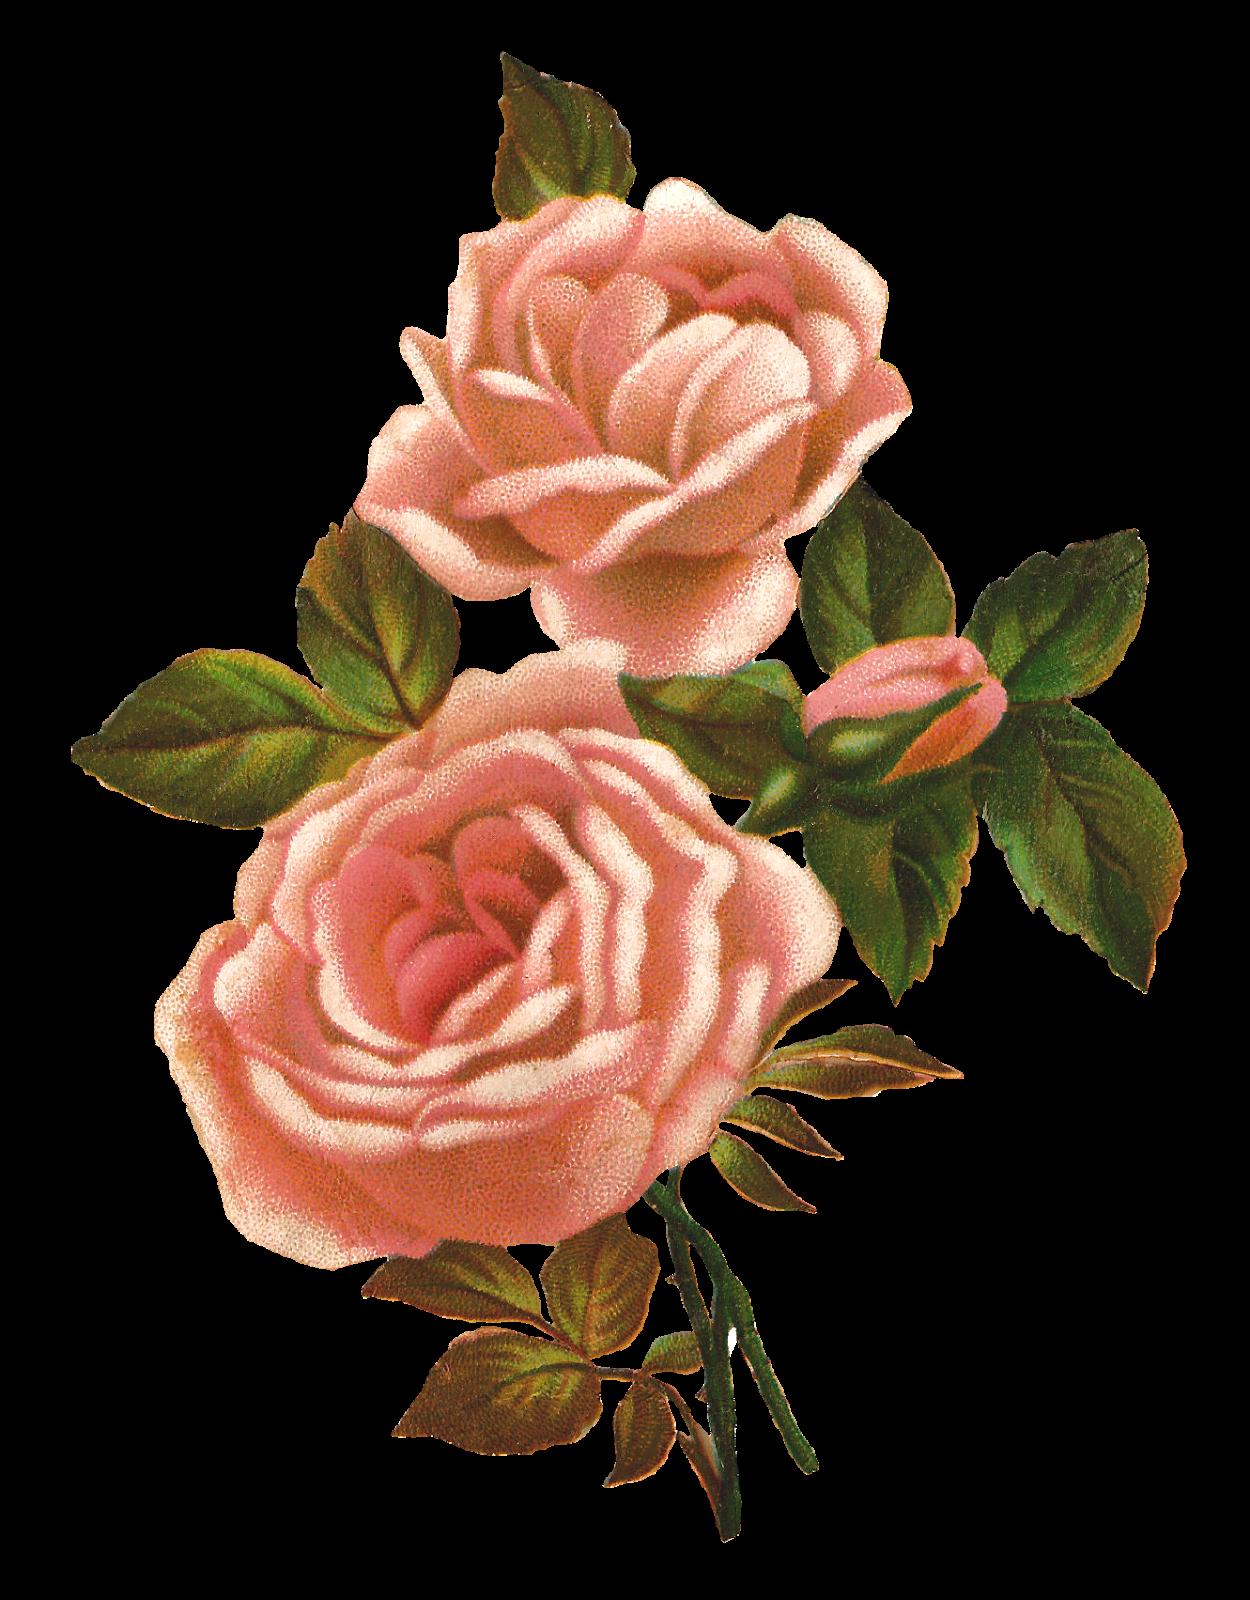 antique images pink rose stock image vintage shabby pink rose clip art background pink roses clipart background